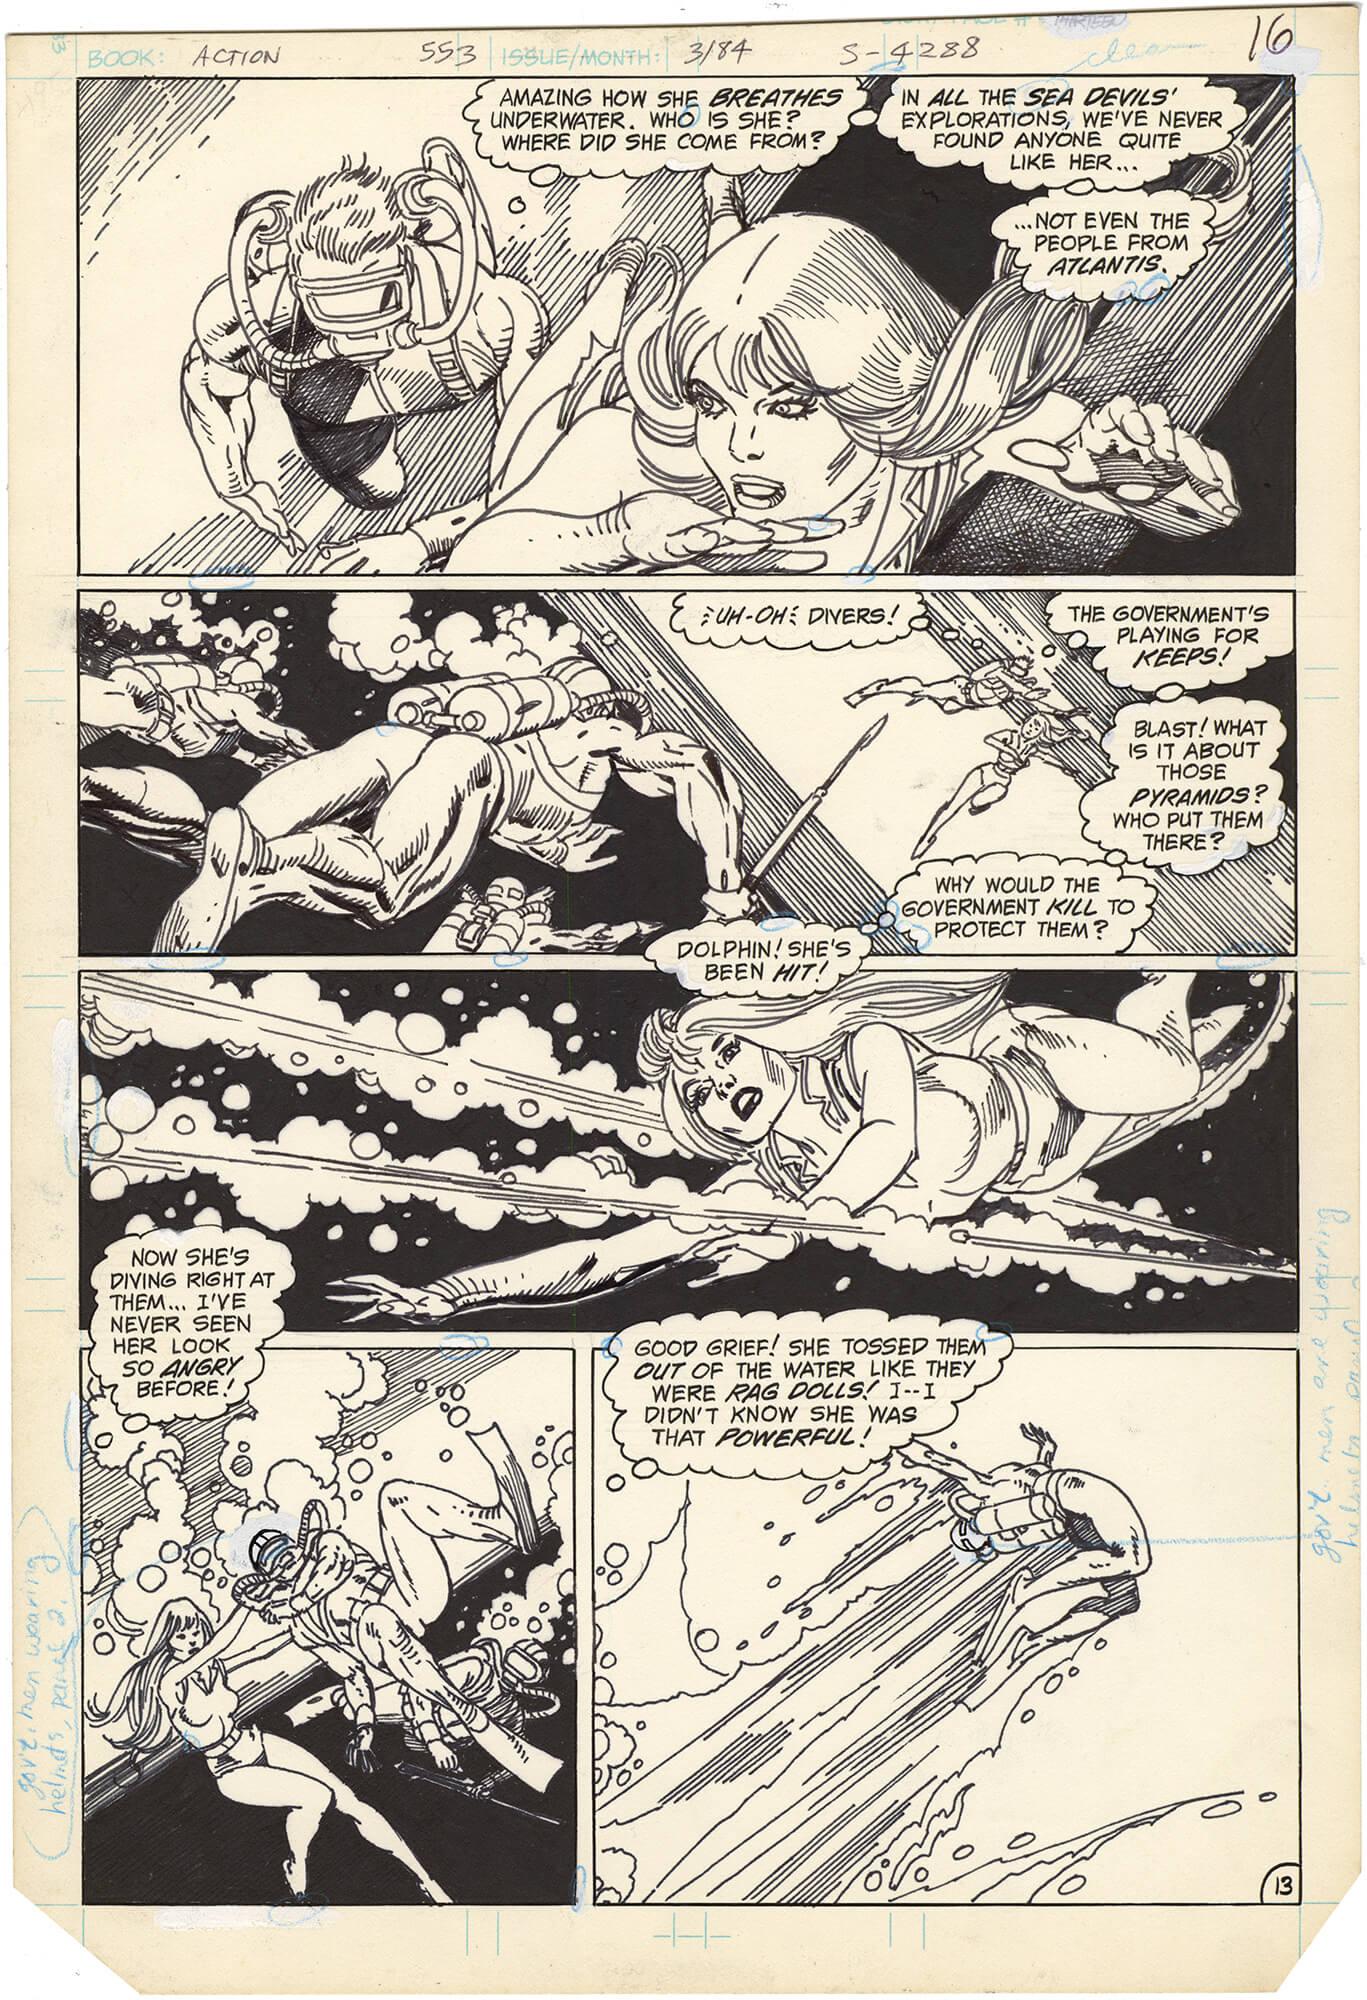 Action Comics #553 p13